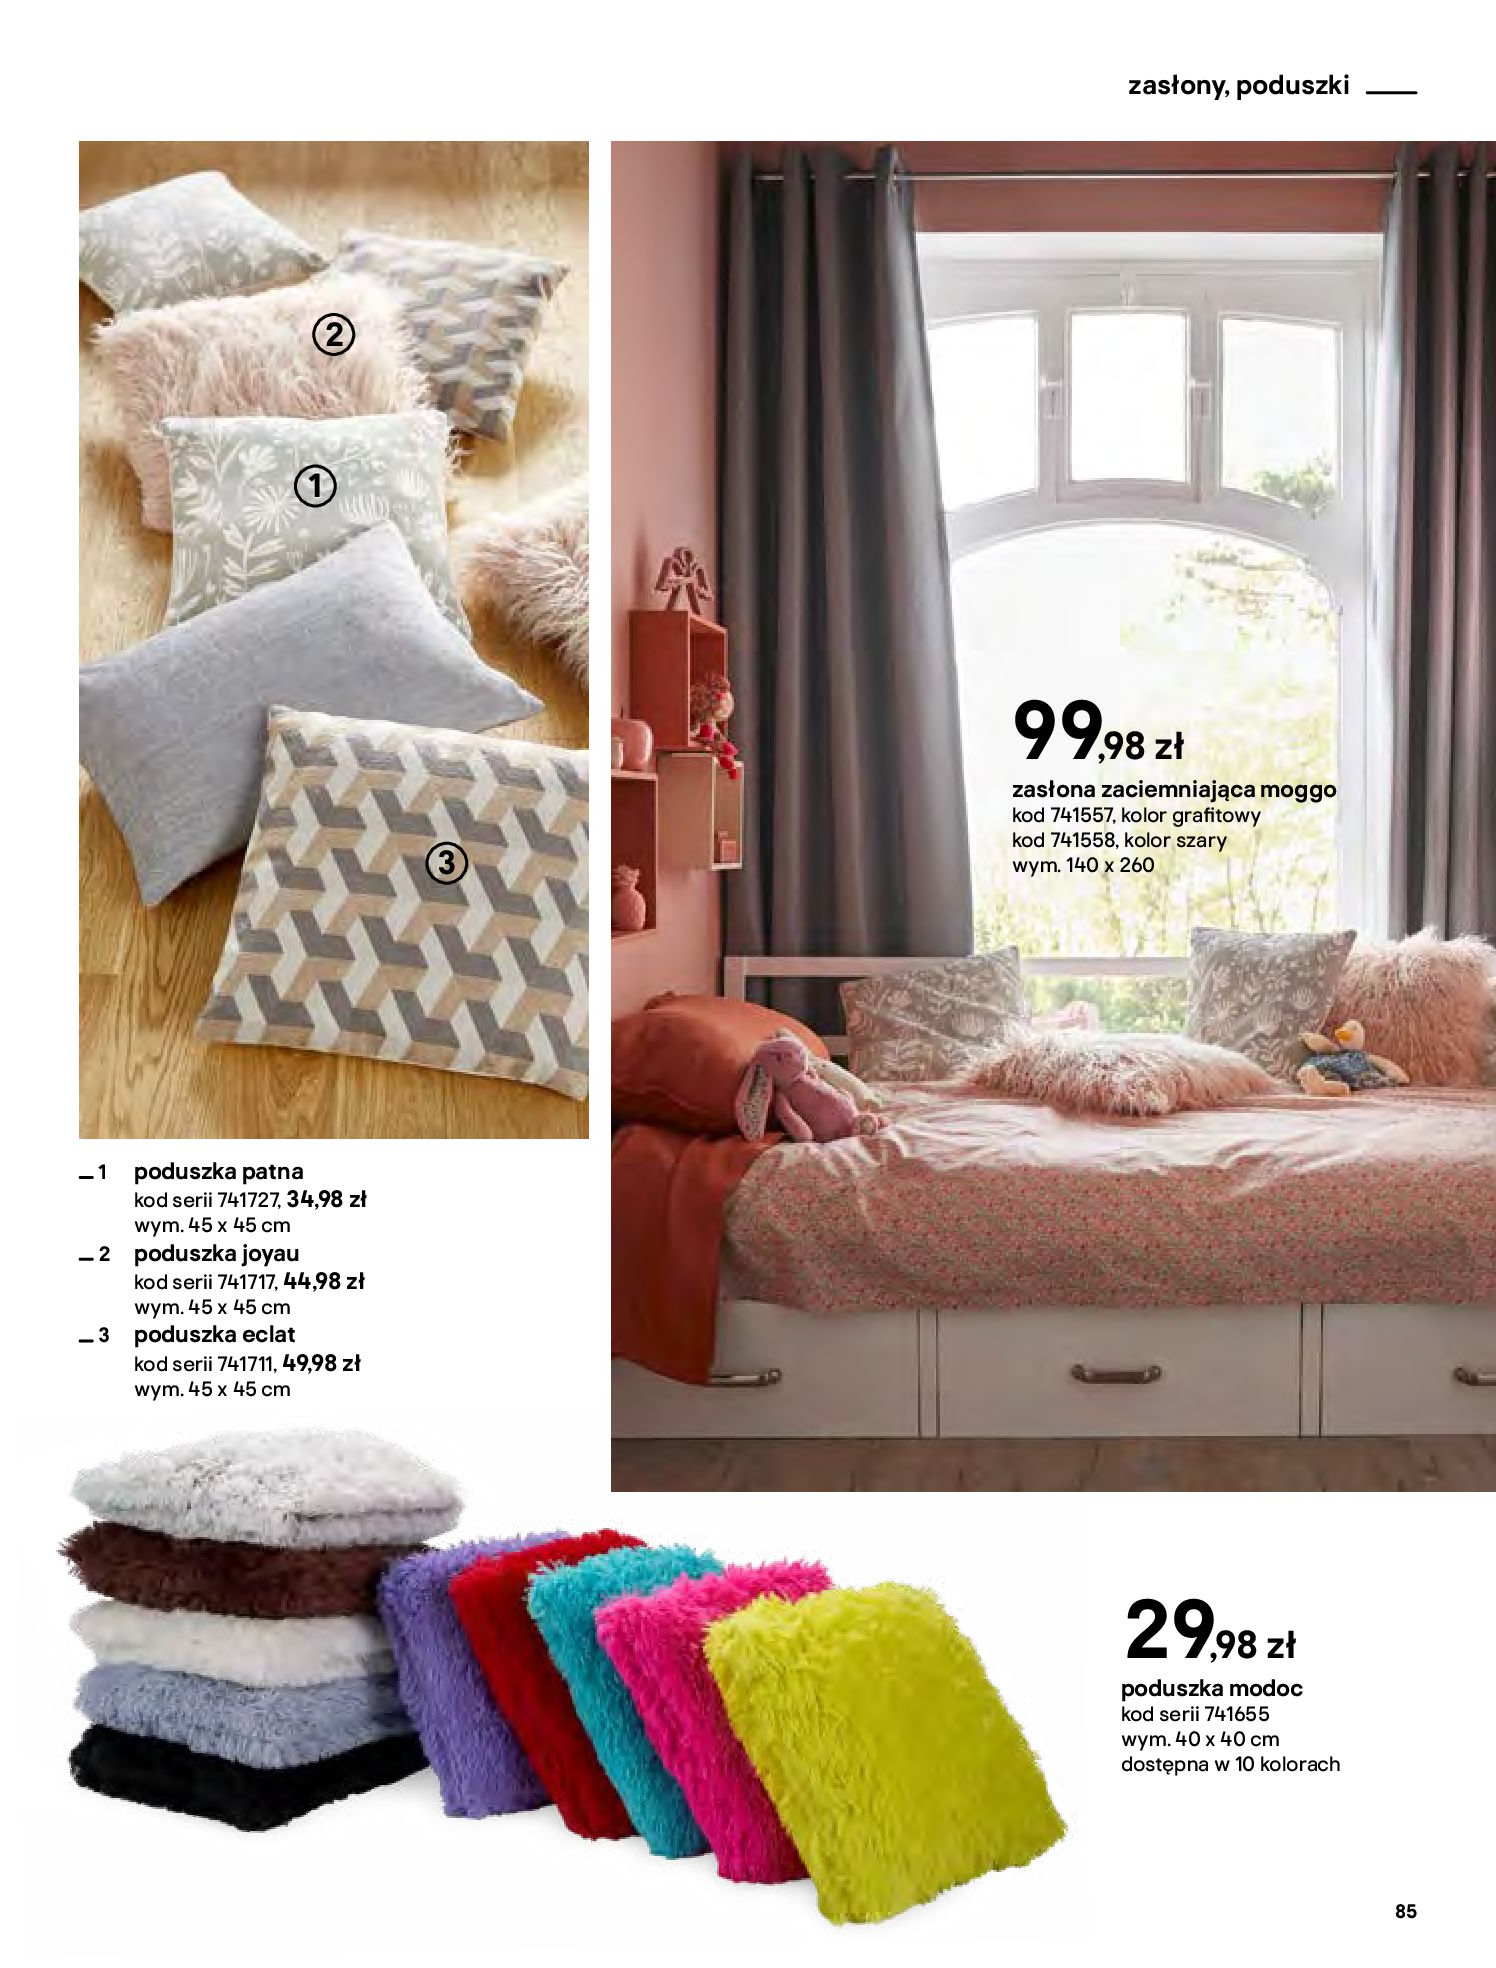 Gazetka Castorama - Katalog Dekoracje-22.10.2020-31.12.2020-page-85